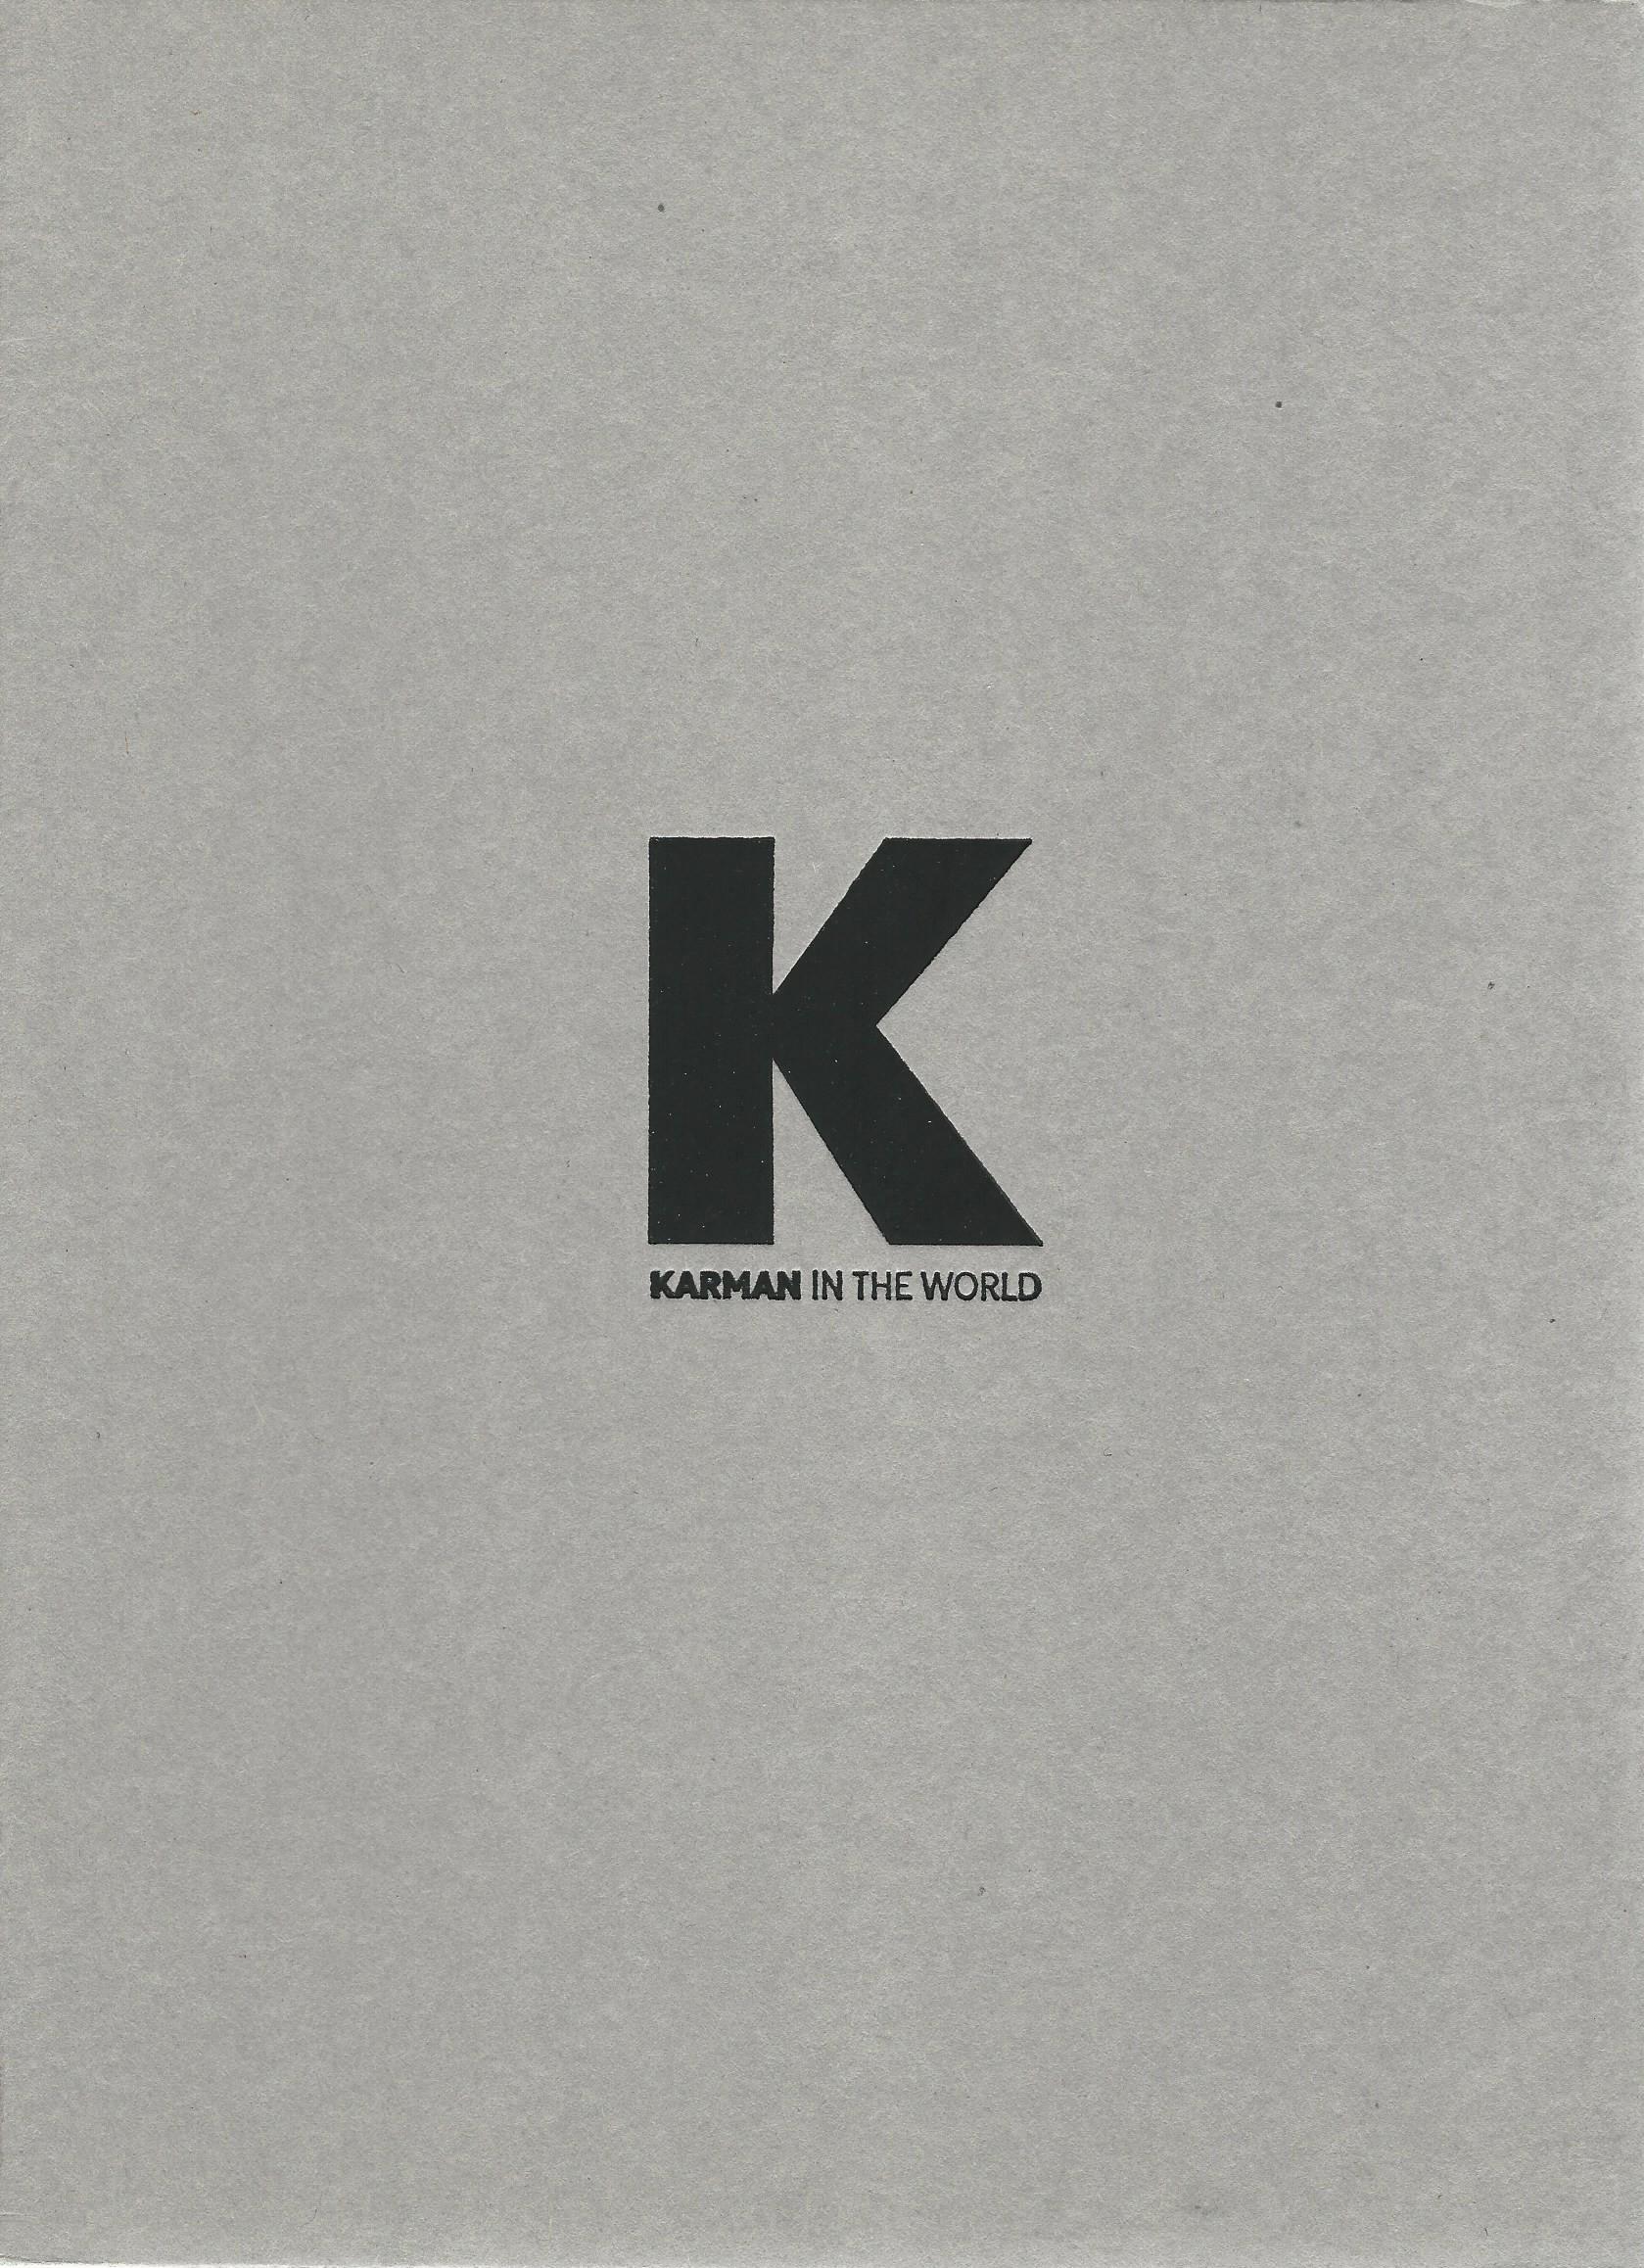 Karman in the World